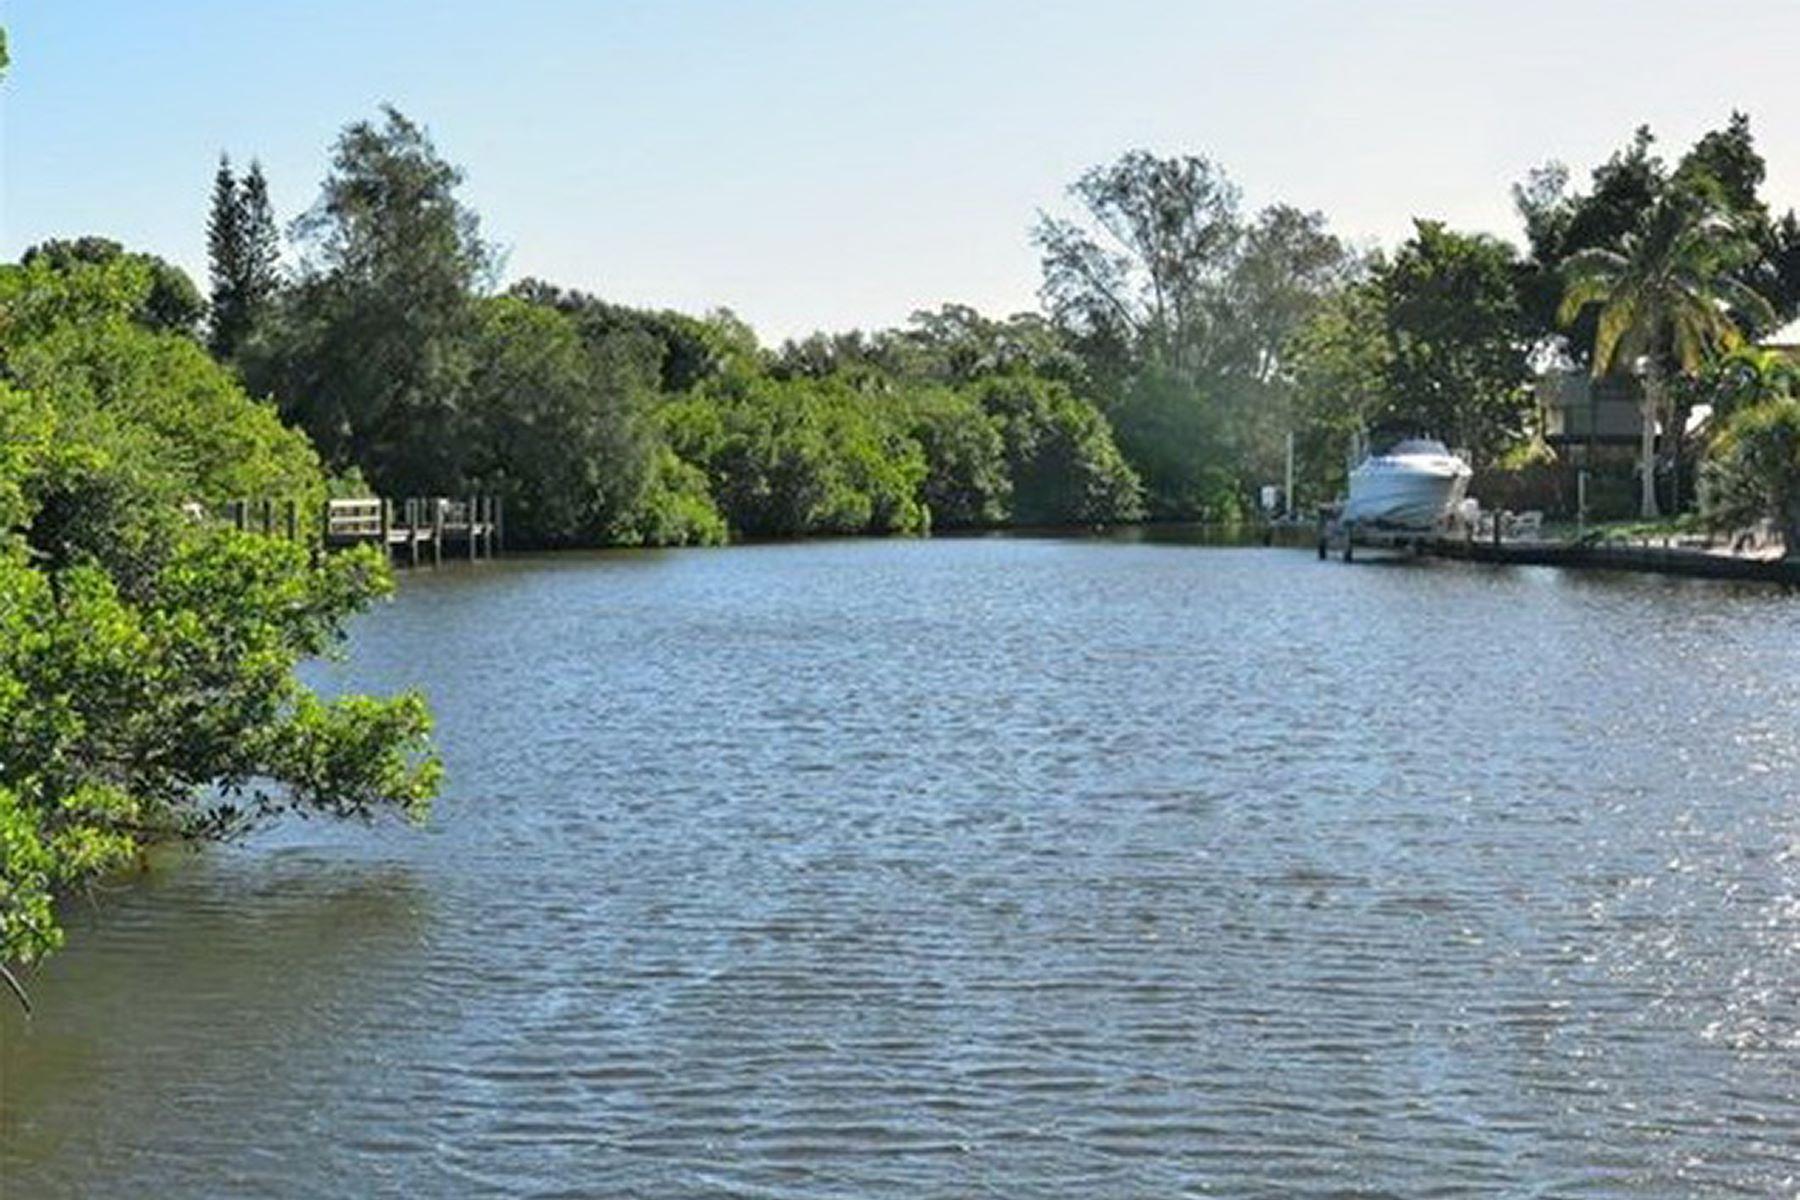 Land for Sale at SIESTA KEY 539 Avenida Del Norte 4 Sarasota, Florida, 34242 United States